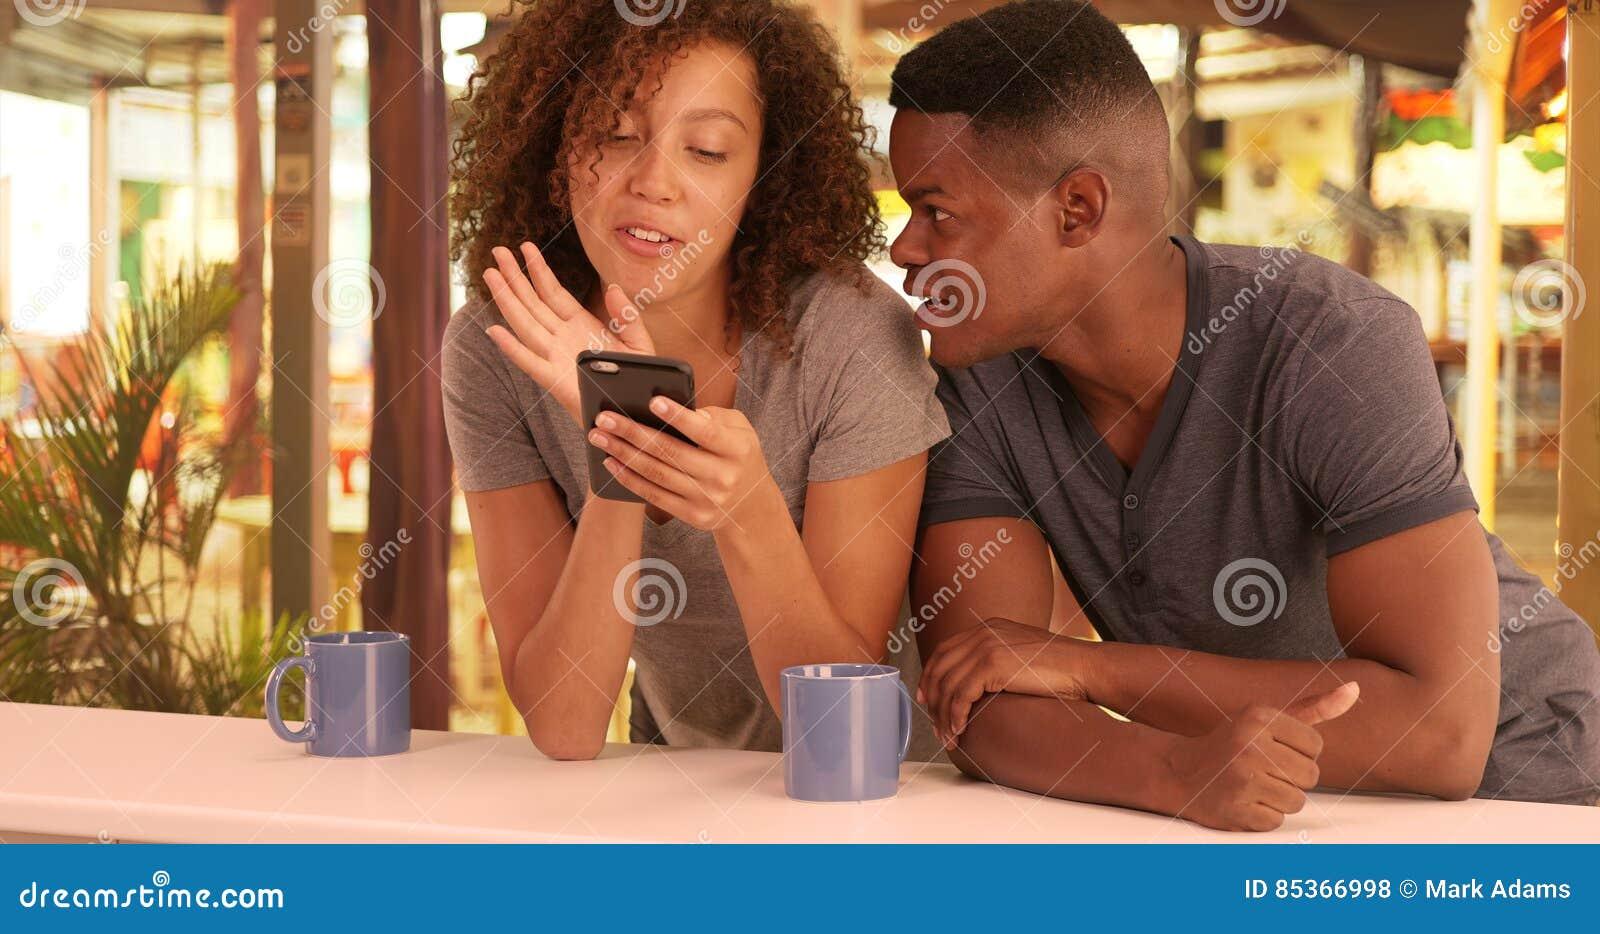 mijn vrouw is dating Another Guy